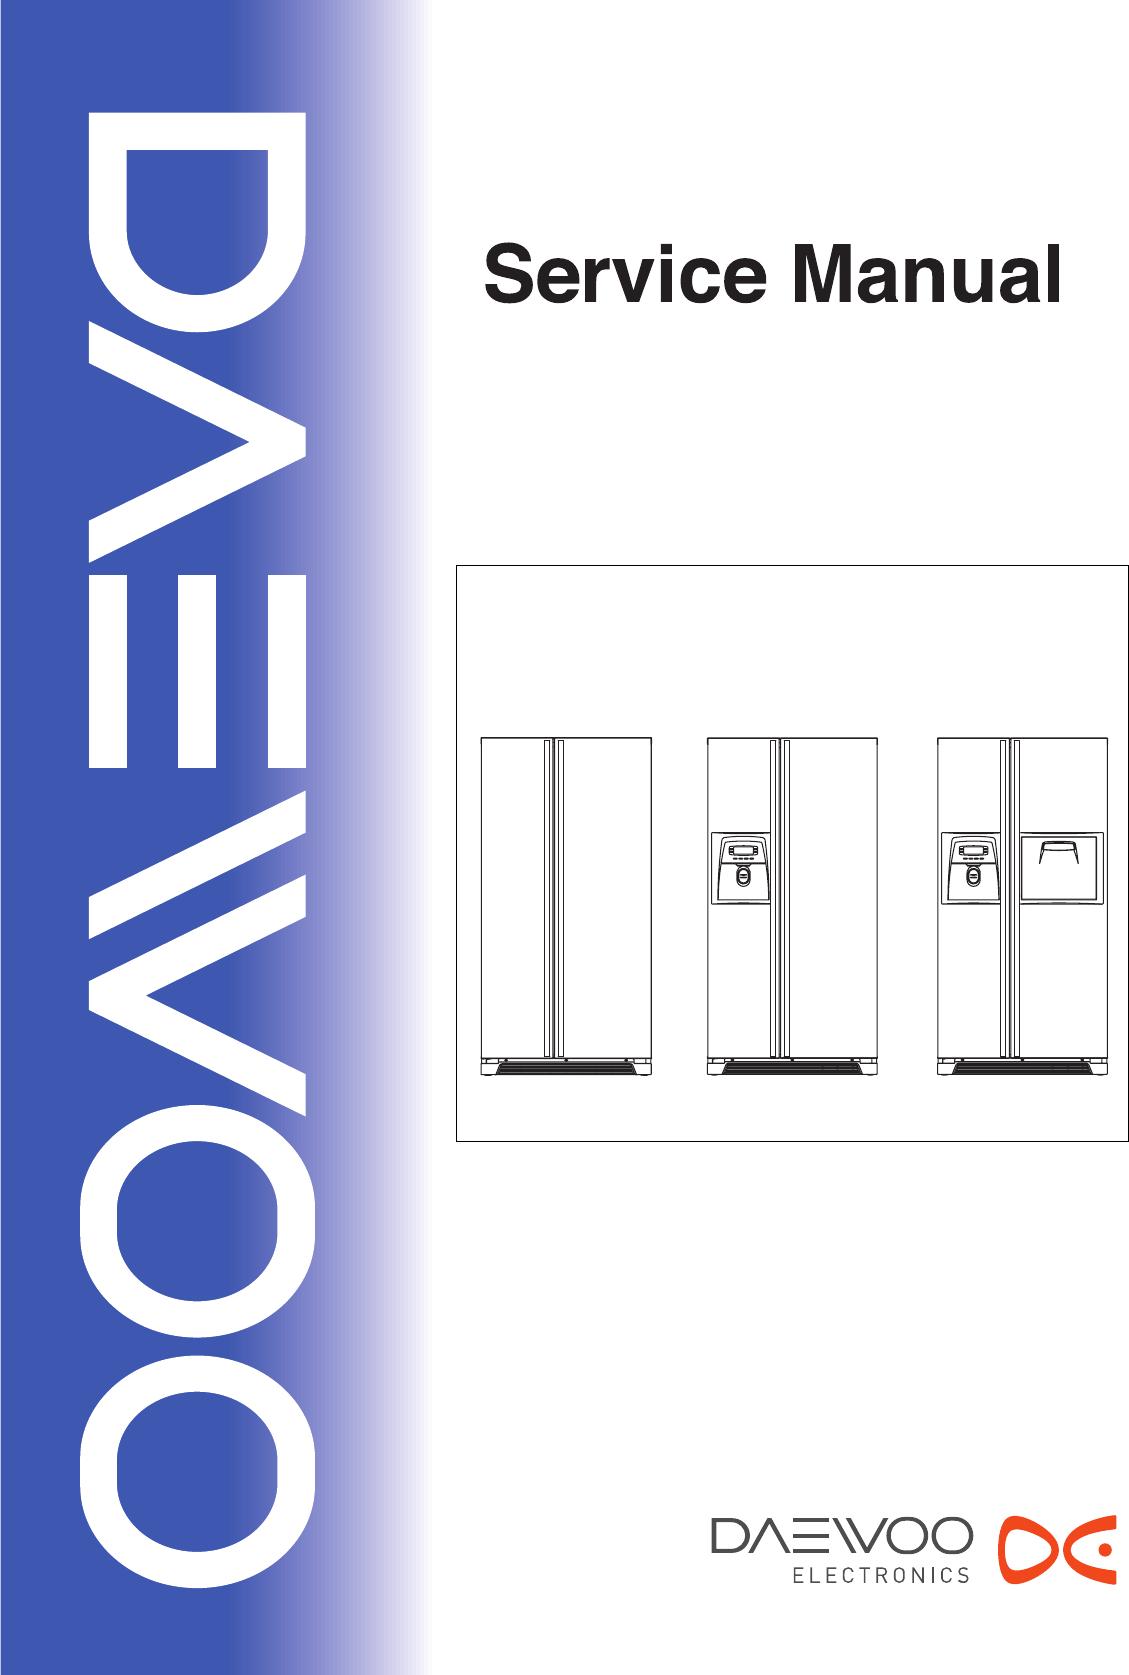 daewoo electronics frs20 users manual frs 20 fridge freezer rh usermanual wiki Daewoo Mini Fridge Daewoo Fridge Self-Defrost